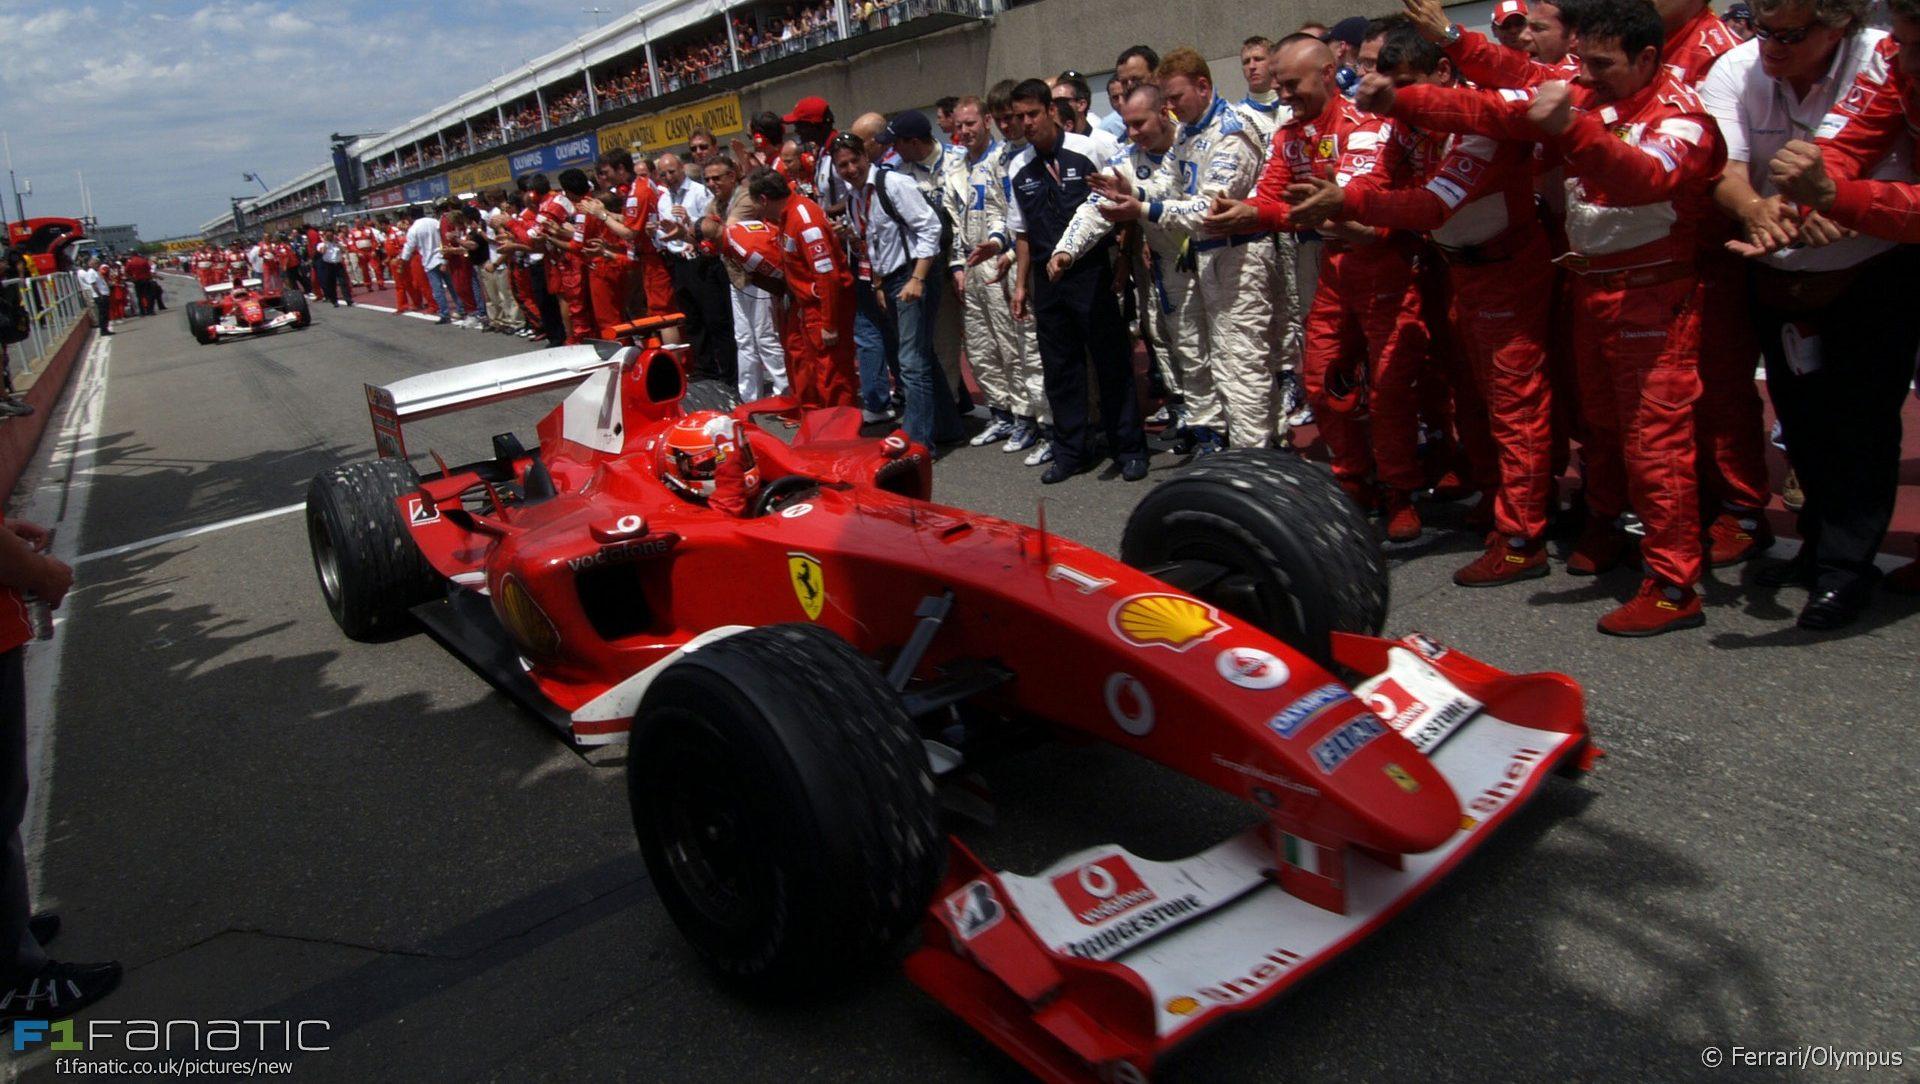 Michael Schumacher, Ferrari, Circuit Gilles Villeneuve, Montreal, 2016